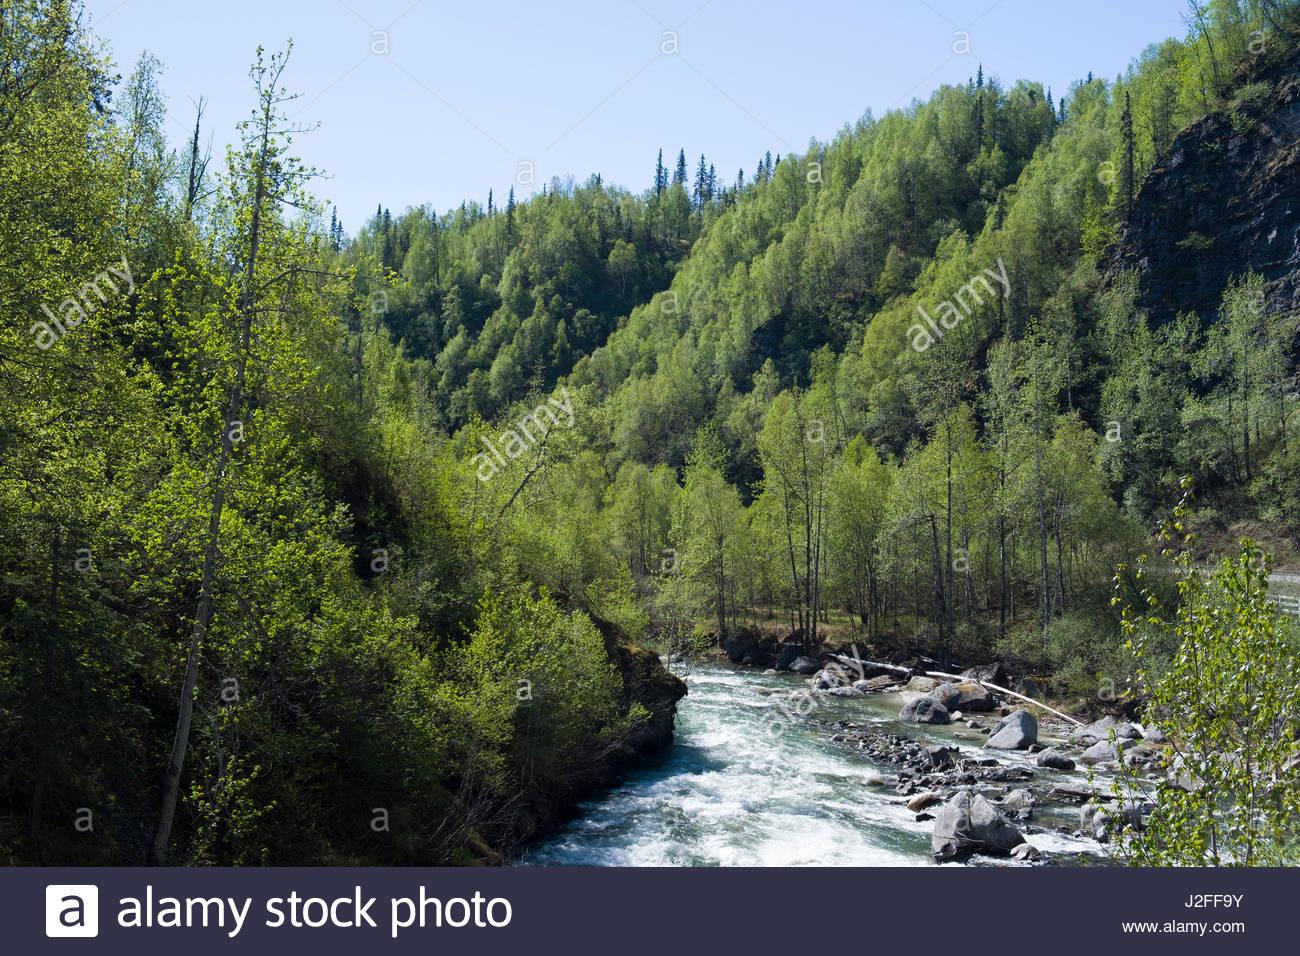 Alaska matanuska susitna county talkeetna - Indian River Matanuska Susitna Borough Alaska Usa Stock Image